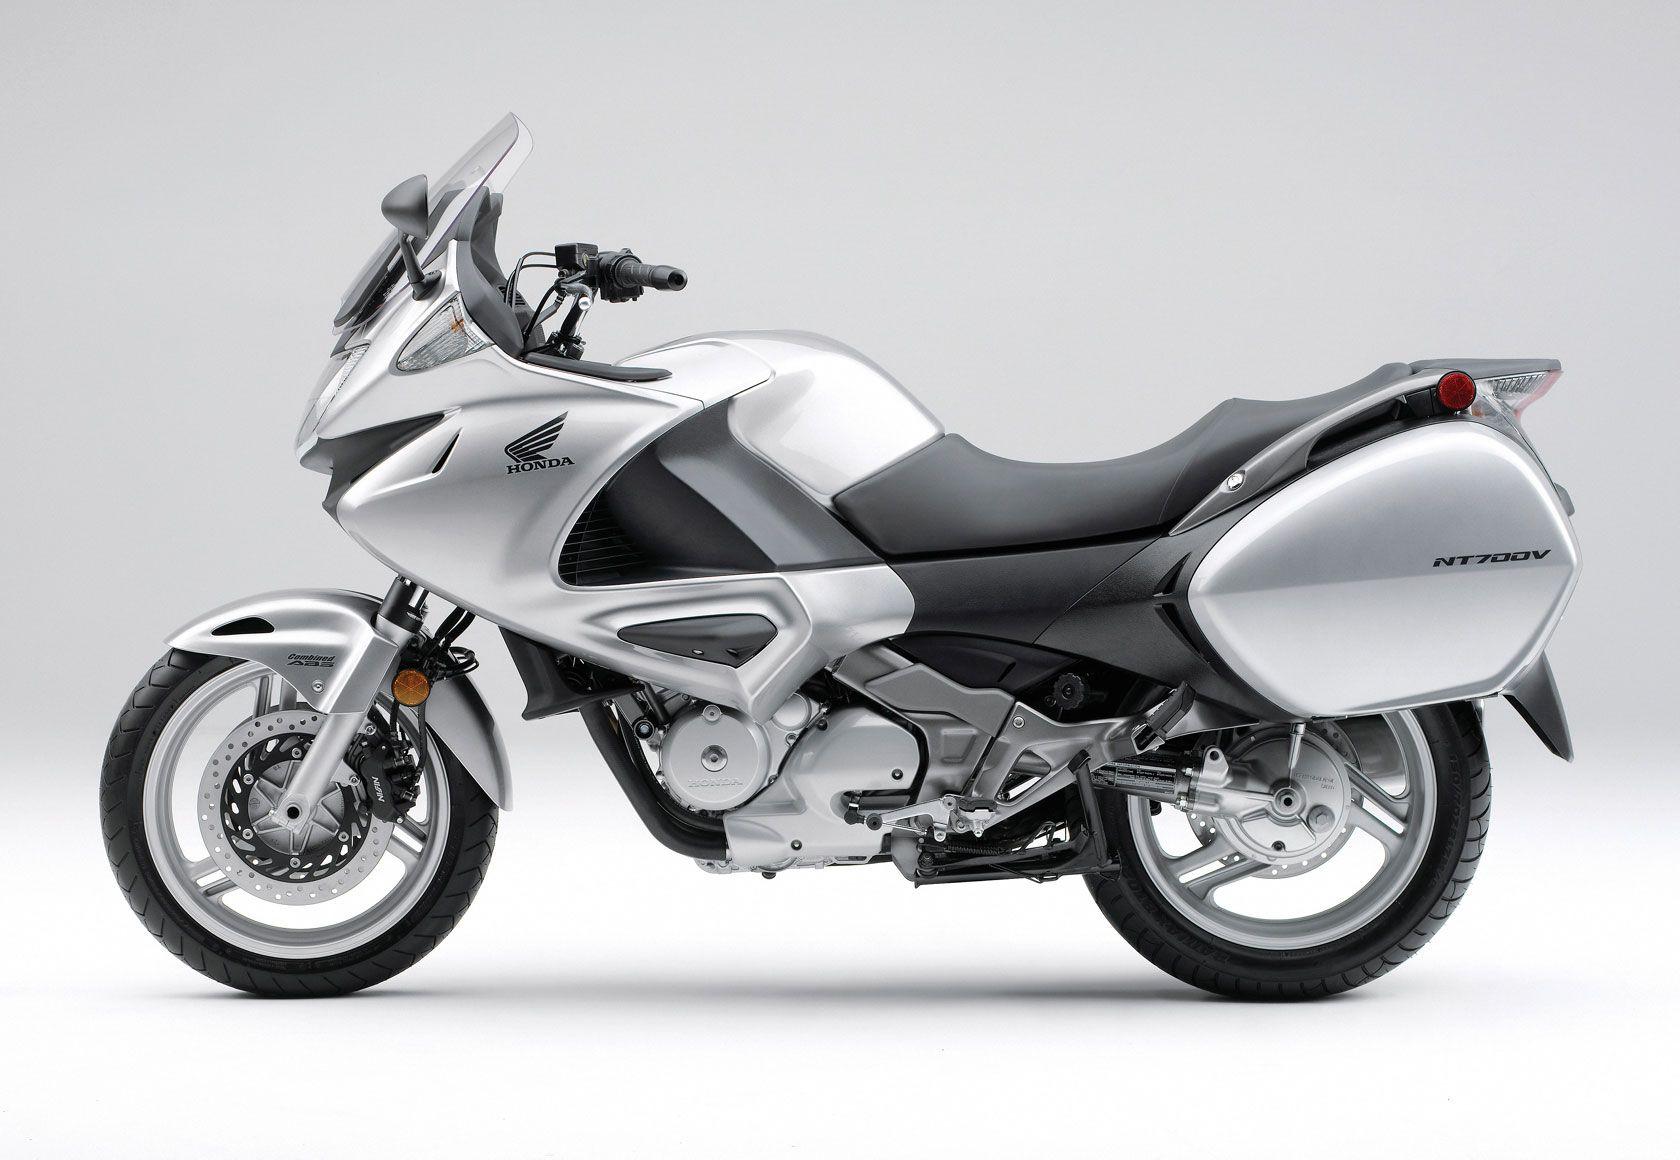 honda nt 700 deauville   Motorcycles and gear   Pinterest   Honda ...